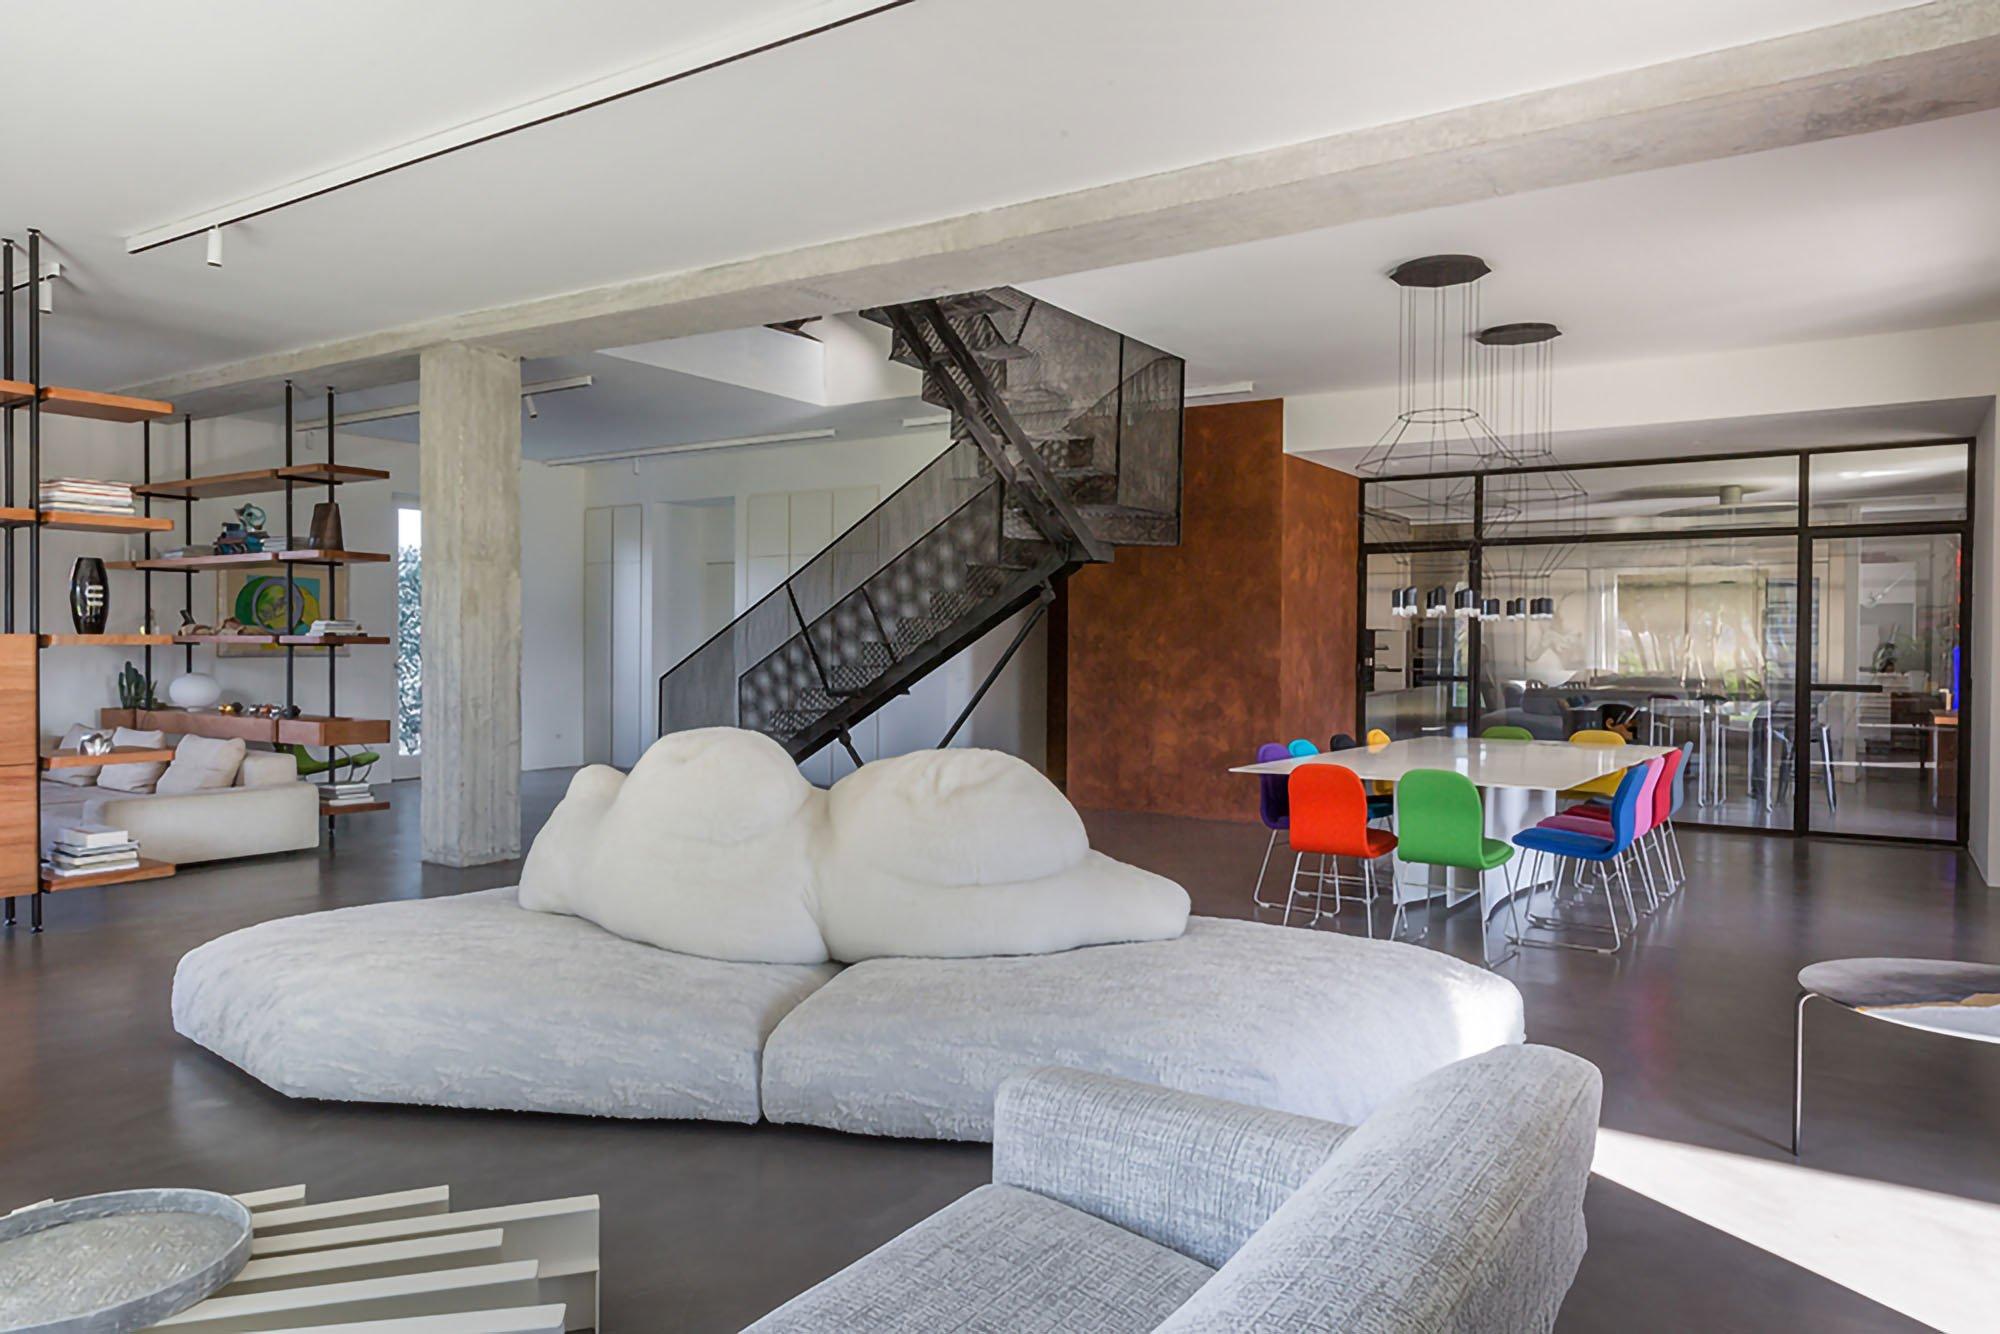 Casa C - Alvisi Kirimoto - ©Serena Eller Vainicher